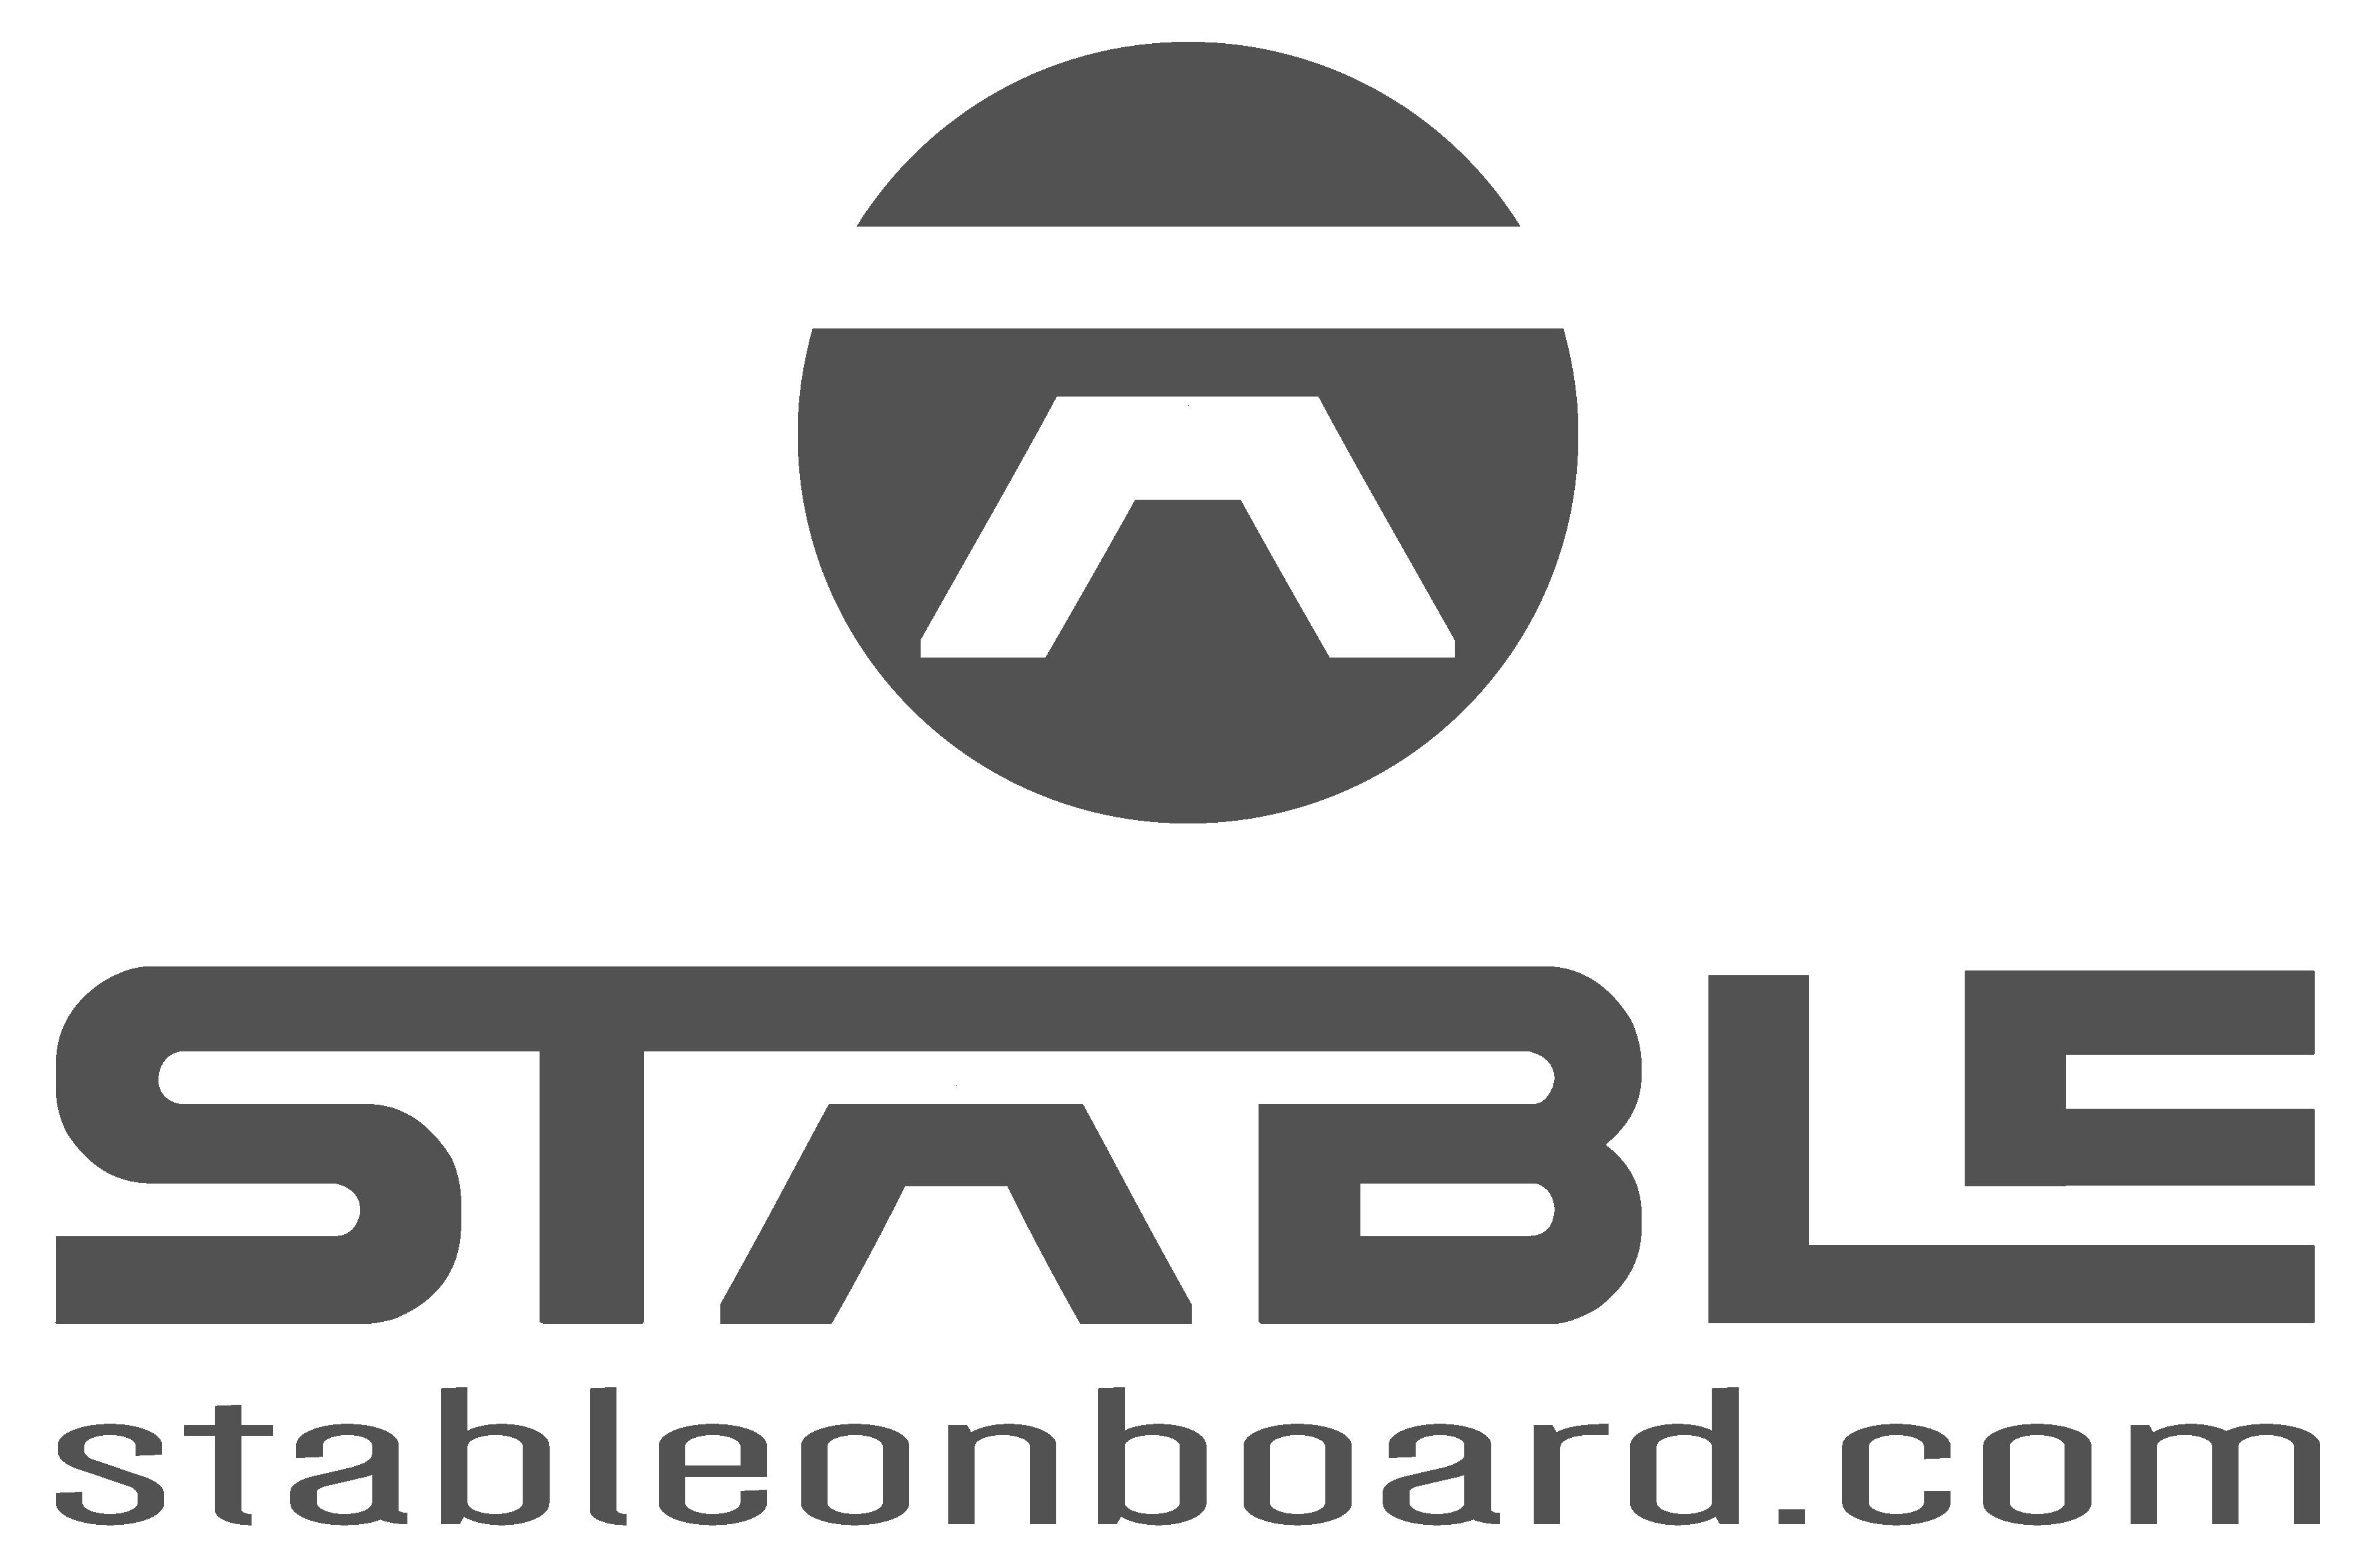 NEW STABLEonboard com logo 03